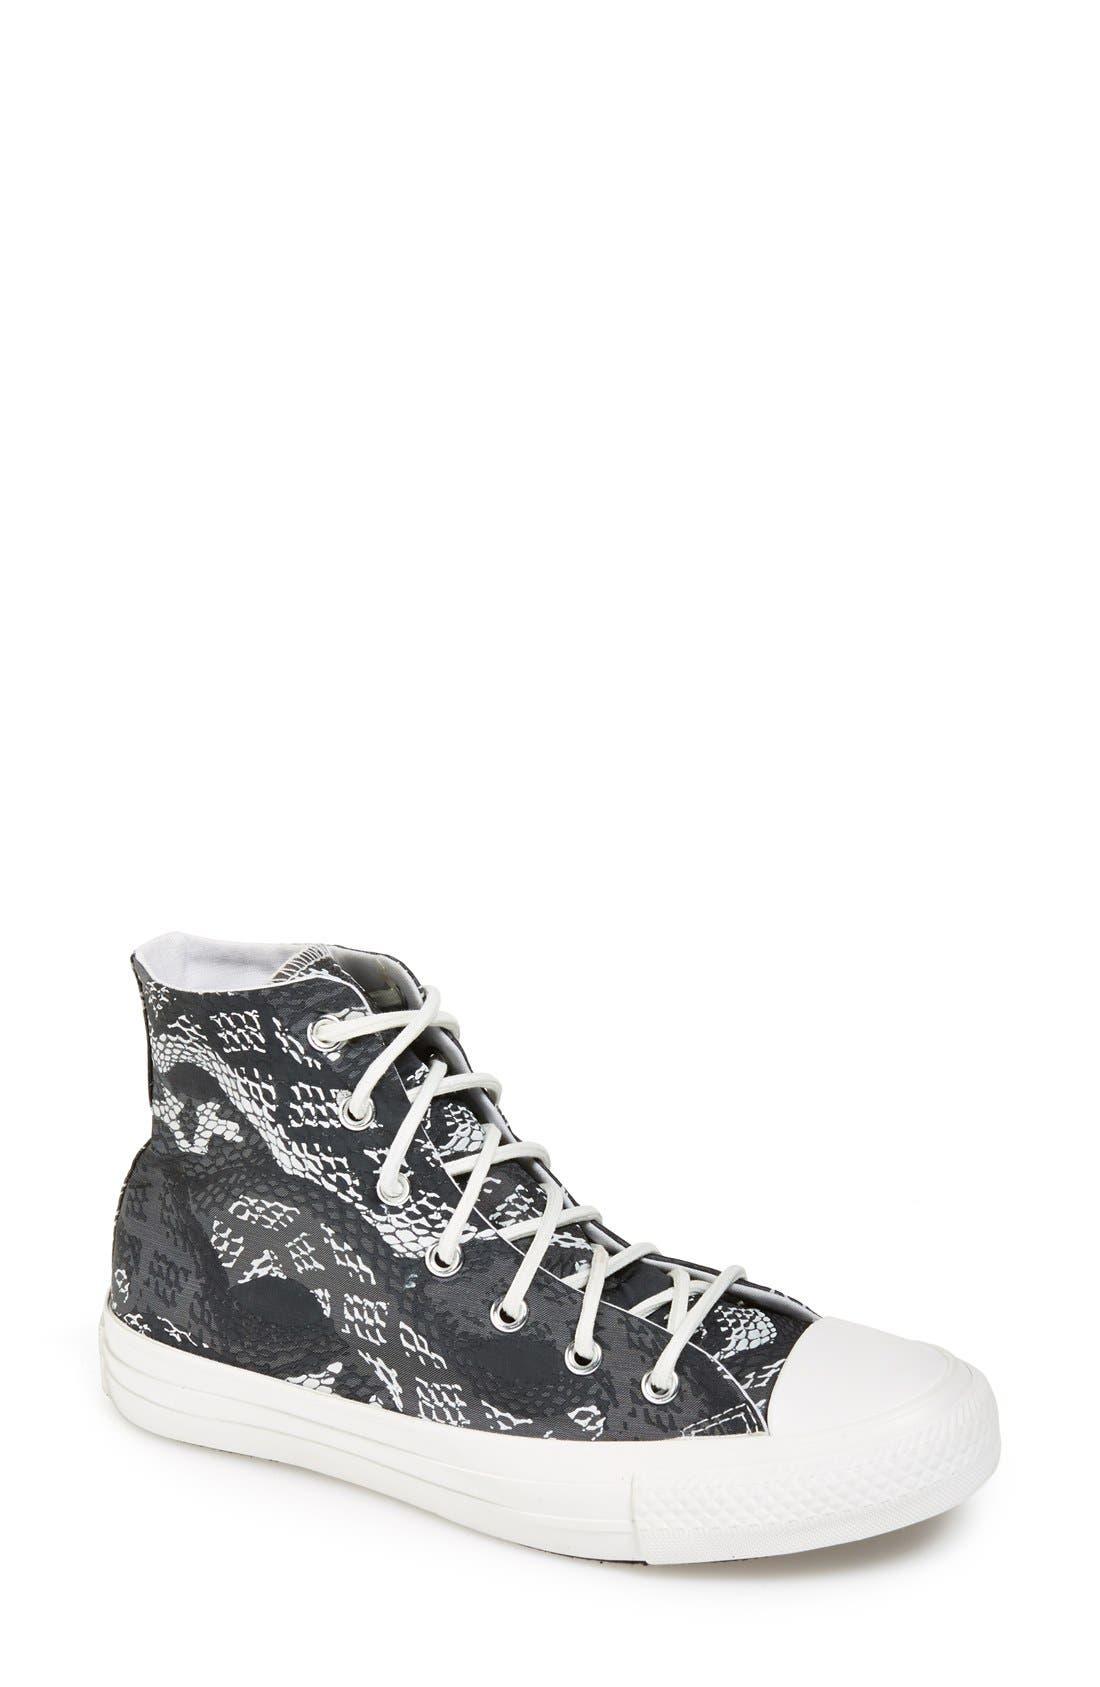 Main Image - Converse Chuck Taylor® 'Reptile Print' High Top Sneaker (Women)